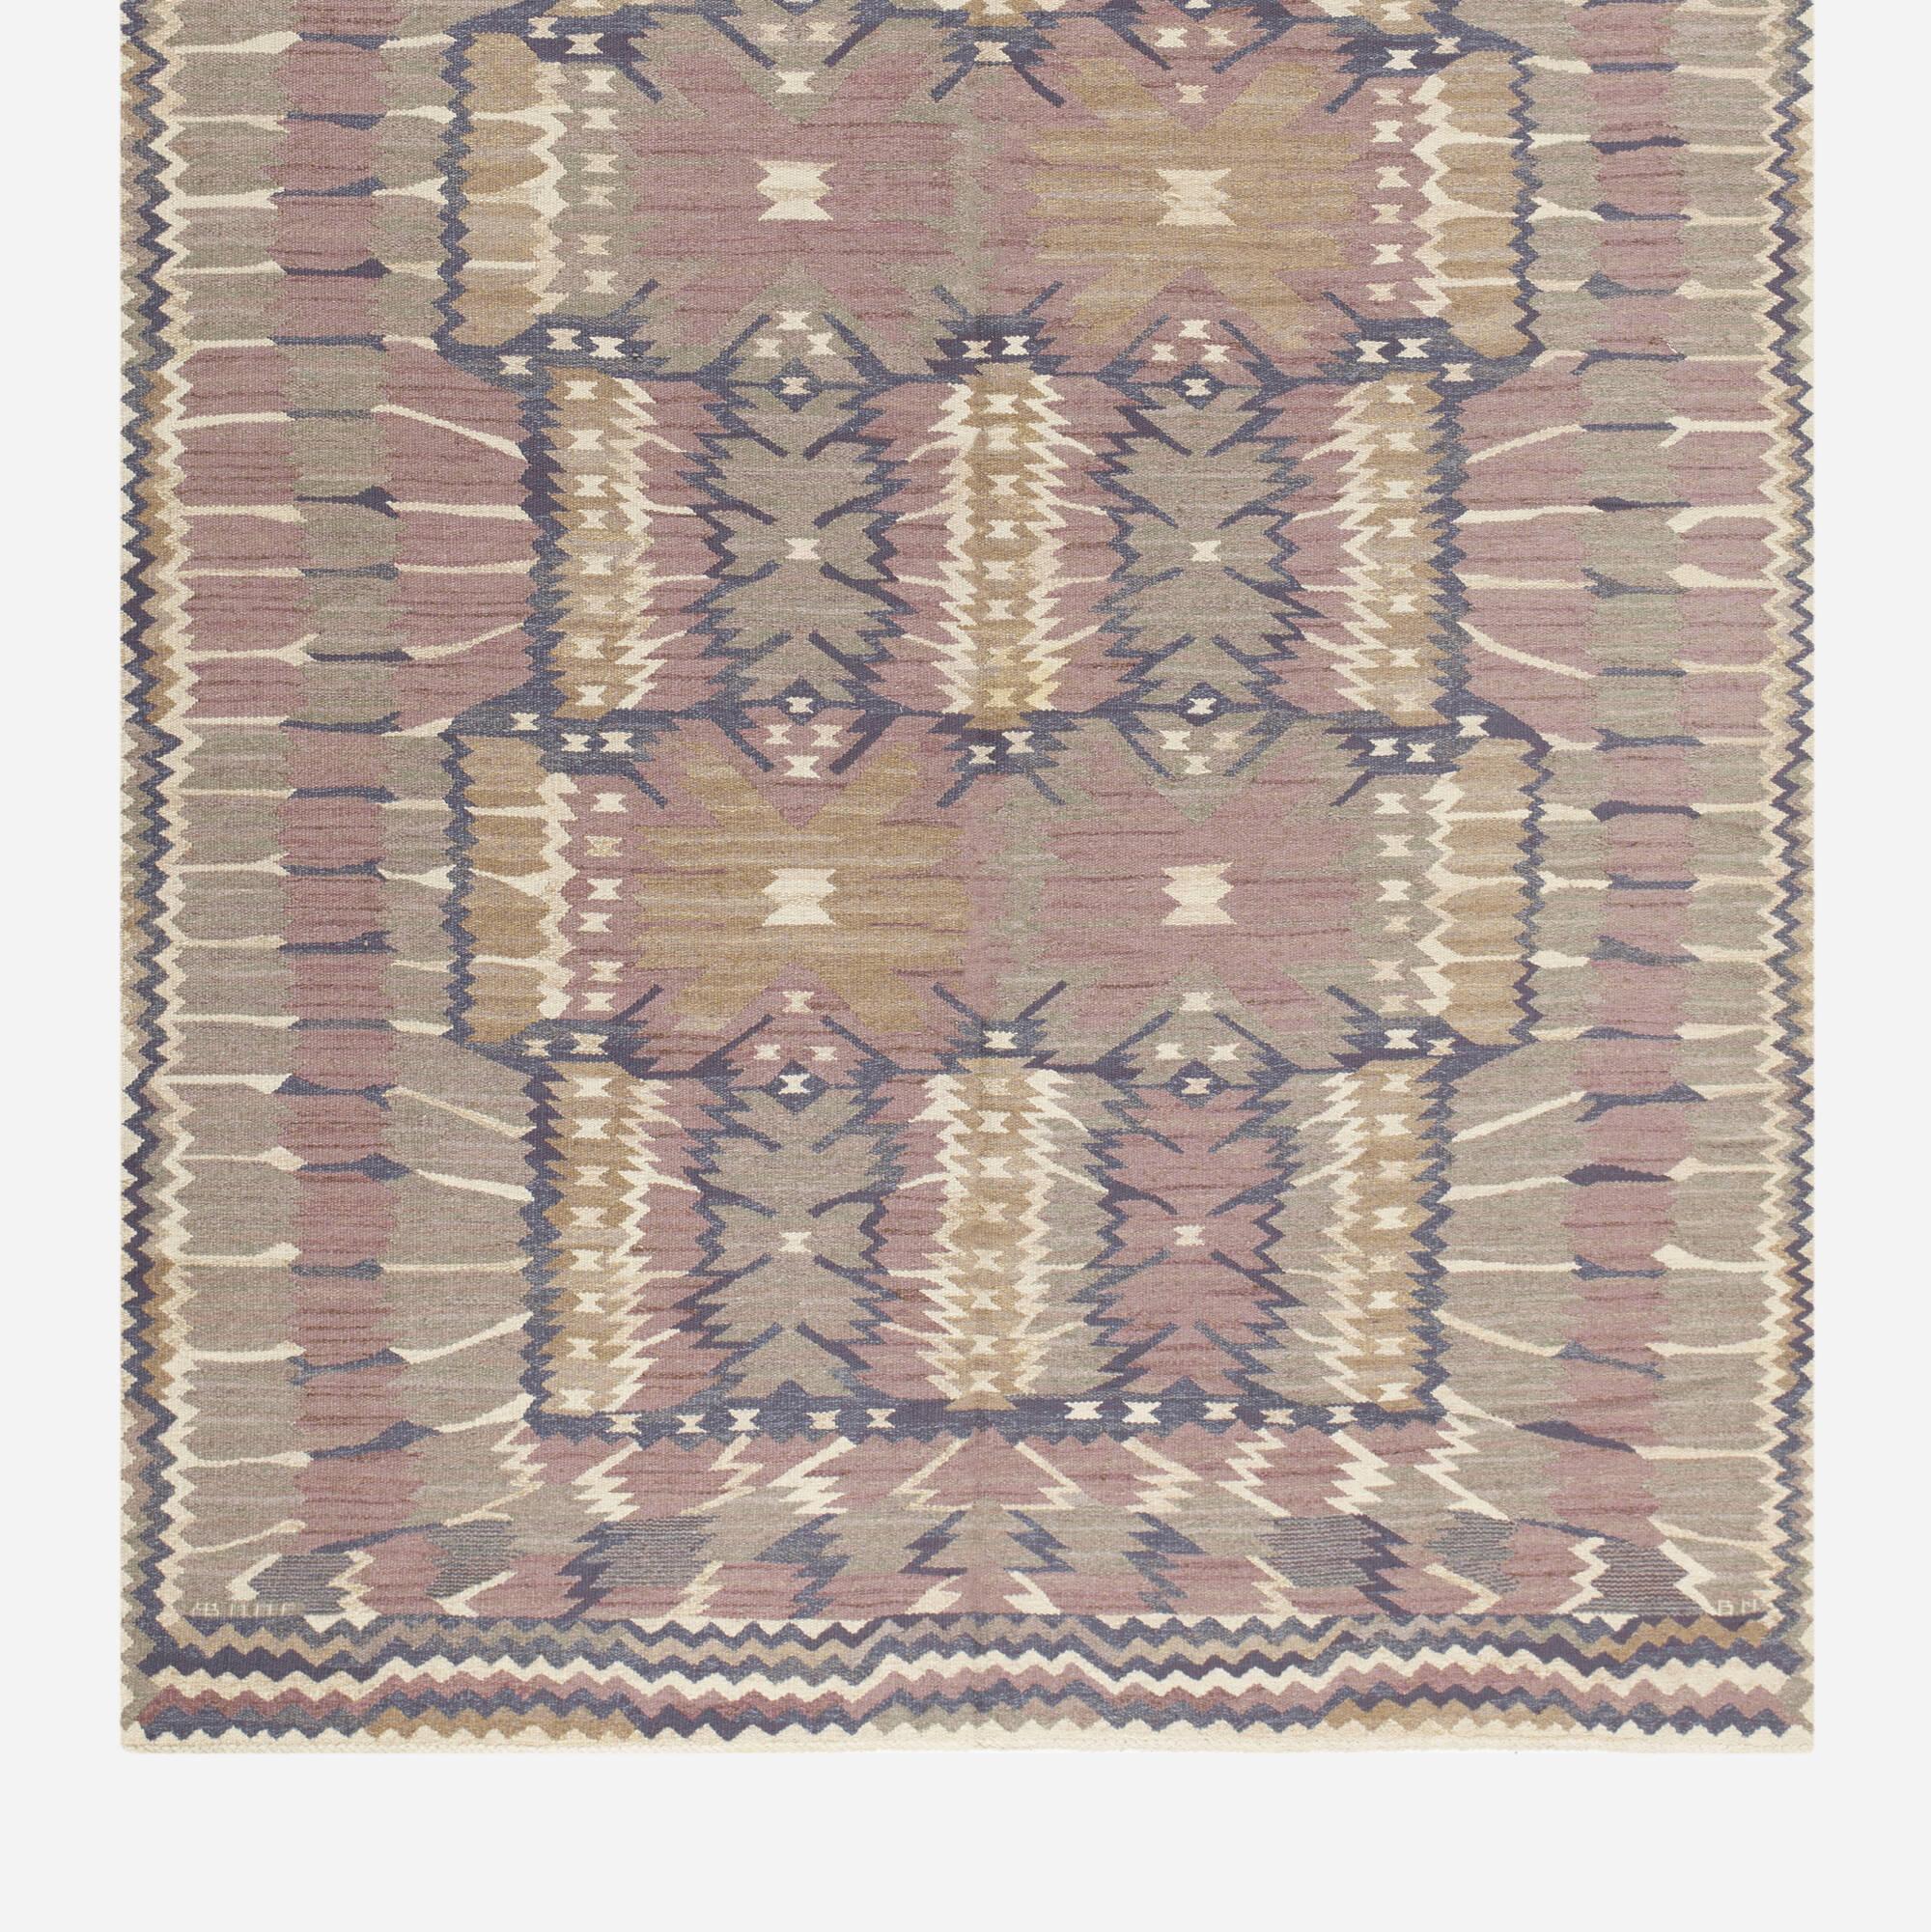 139: Barbro Nilsson / Strålblomman tapestry weave carpet (2 of 2)